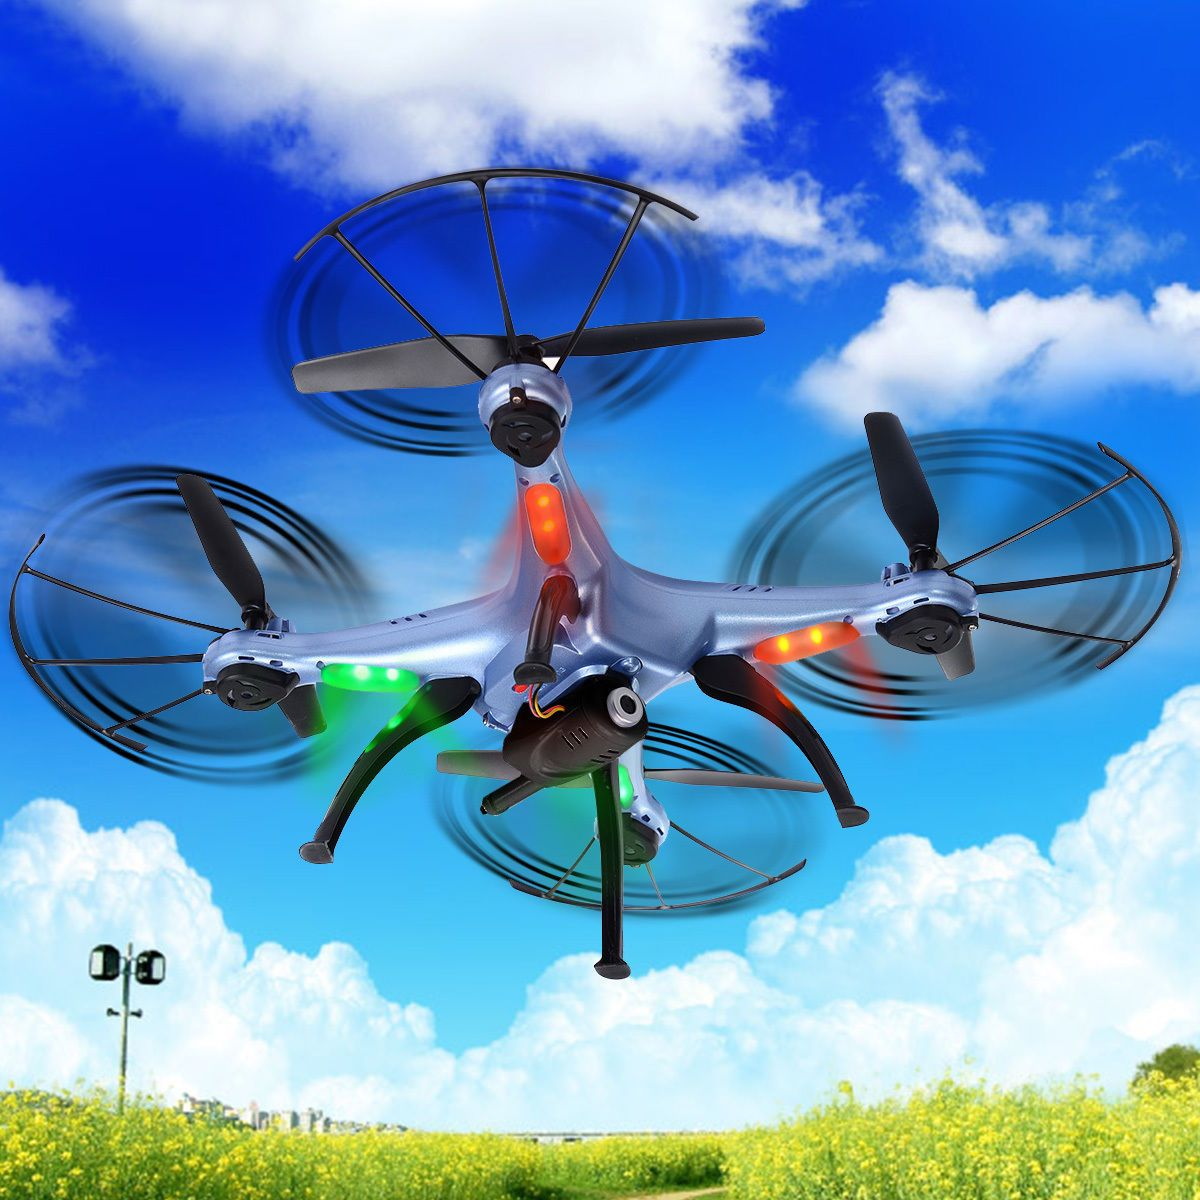 SYMA X5HW 2.4G 4CH 6 Axis FPV RC Quadcopter Drone w// 2.0MP HD Wifi Camera